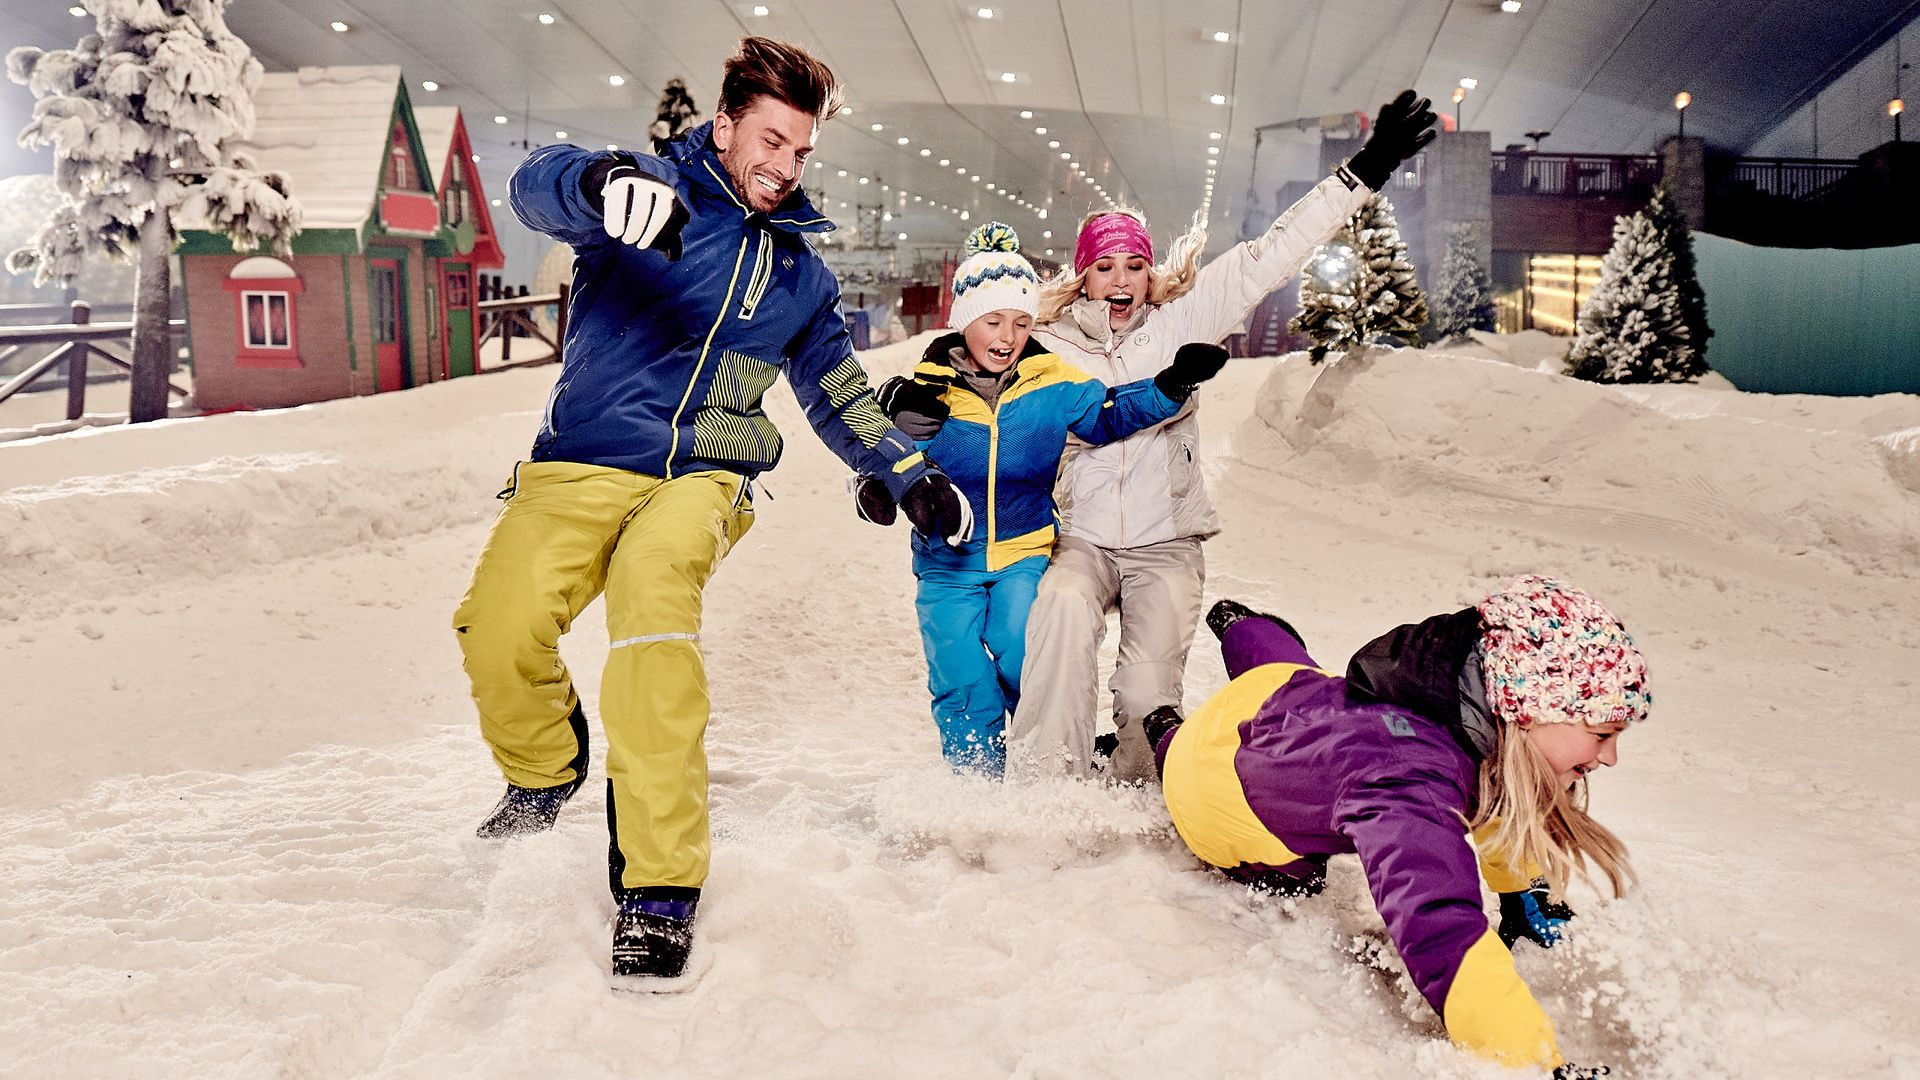 Ski Dubai Snow Park: Fast Track